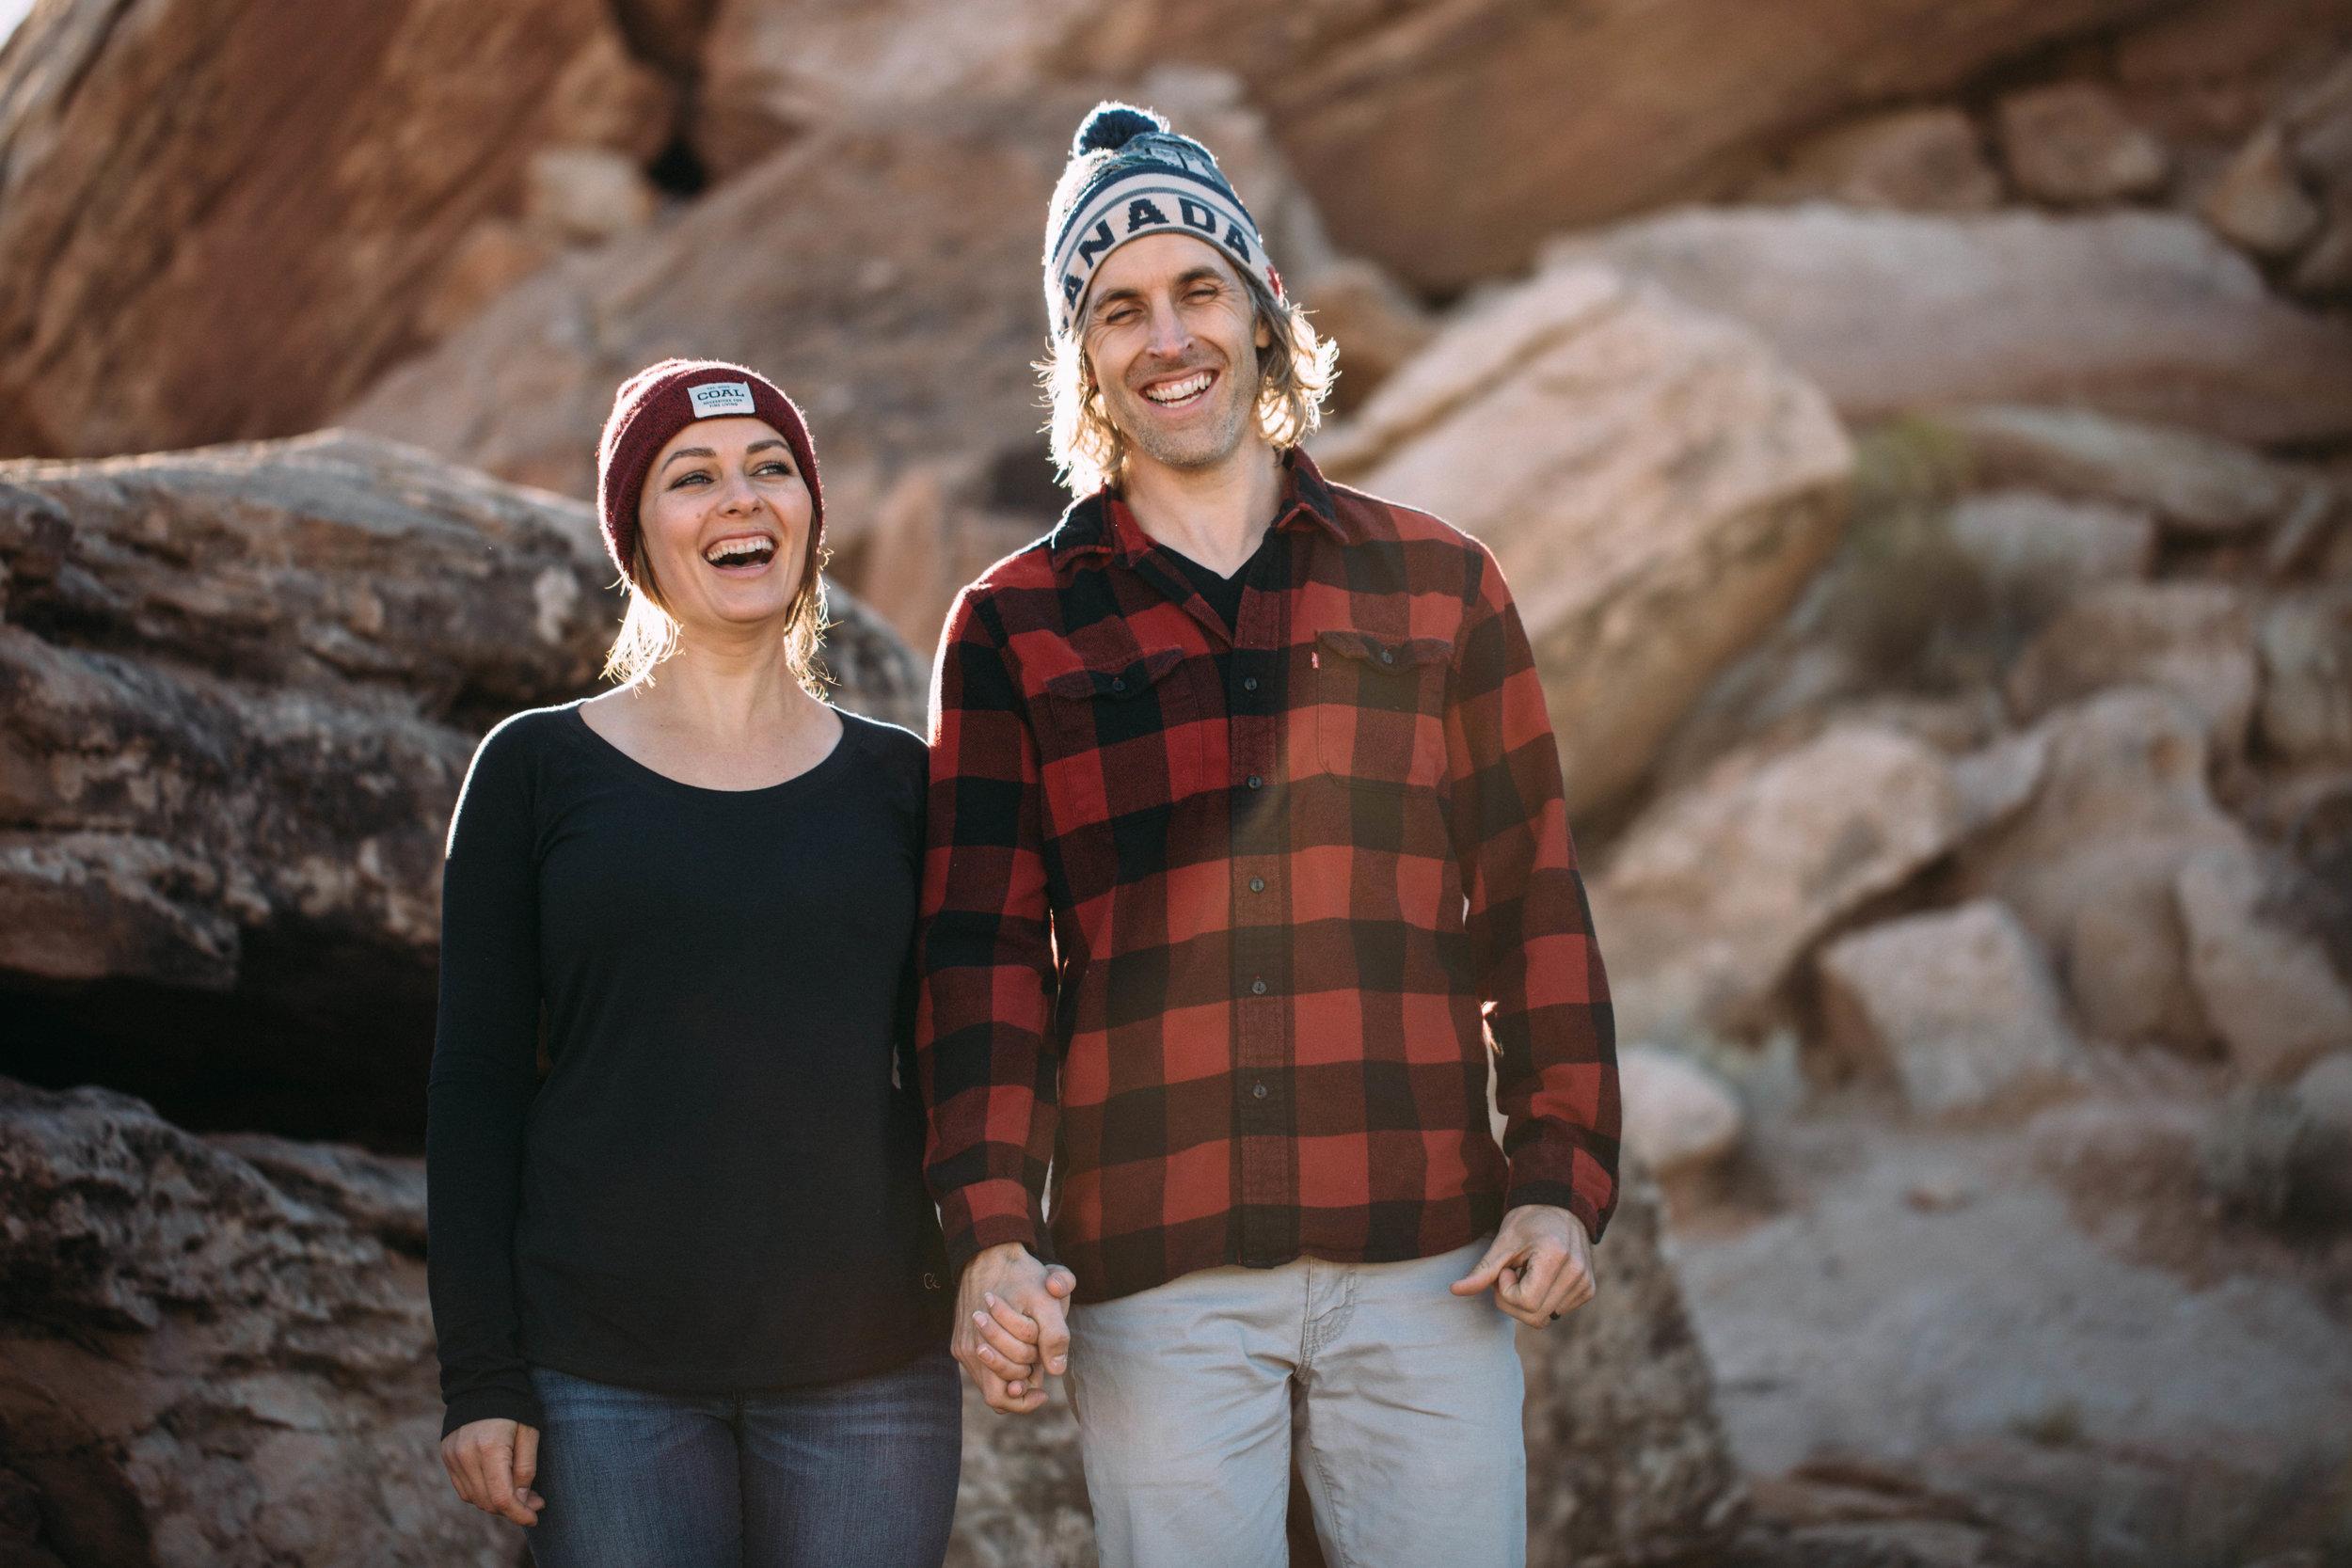 Laughing-Fun-Adventurous-Couple.jpg